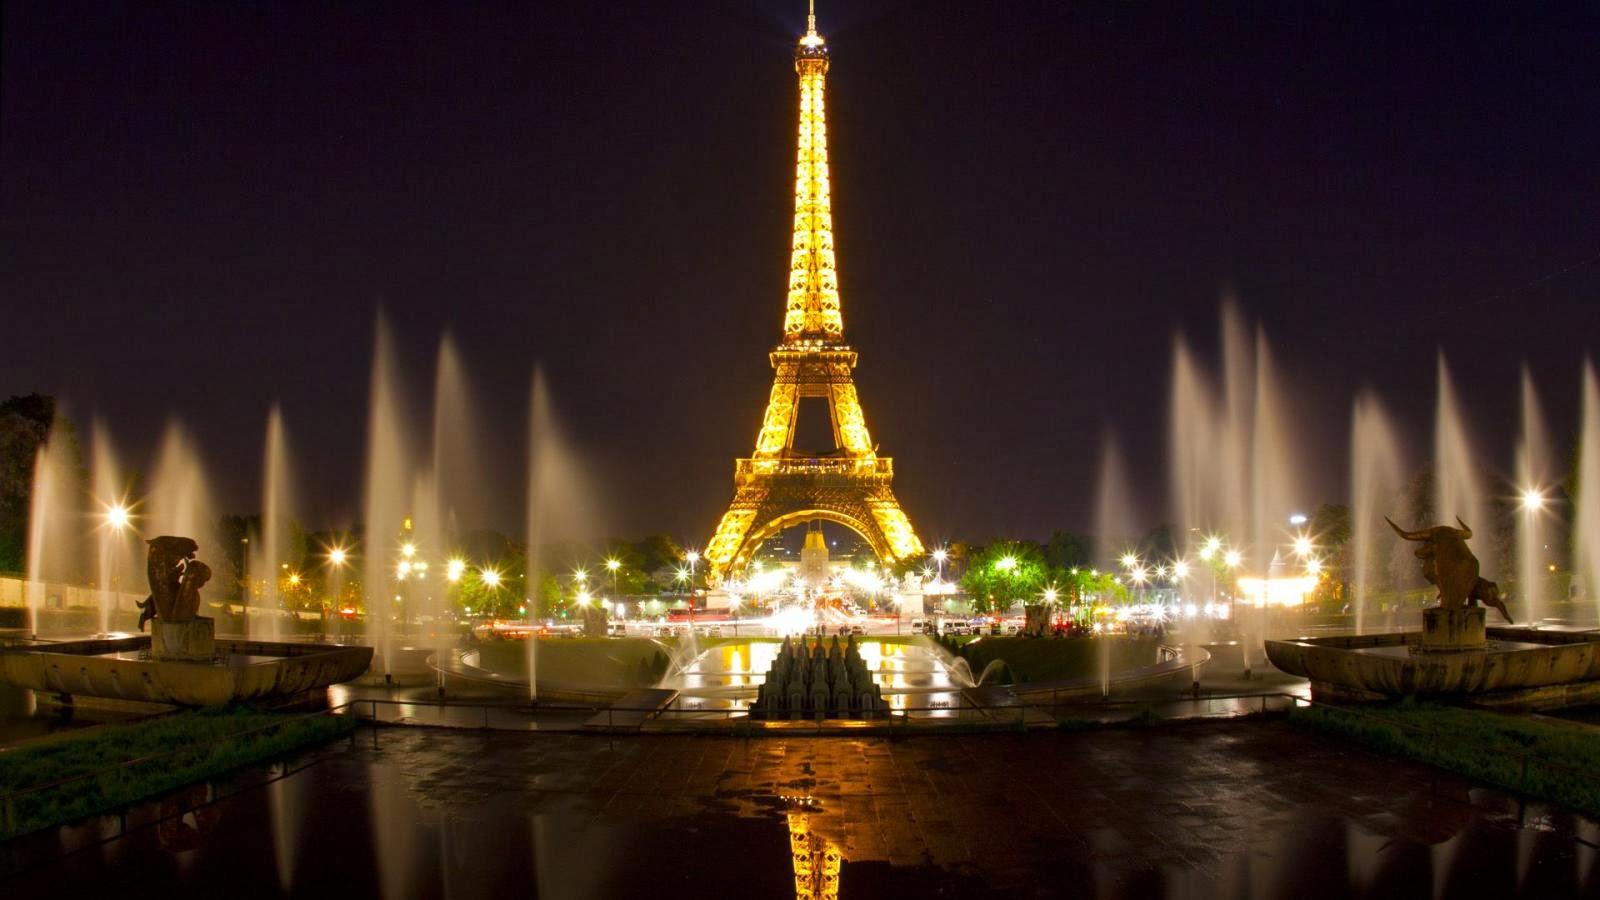 Menara Eiffel Wallpaper Posted By Samantha Walker